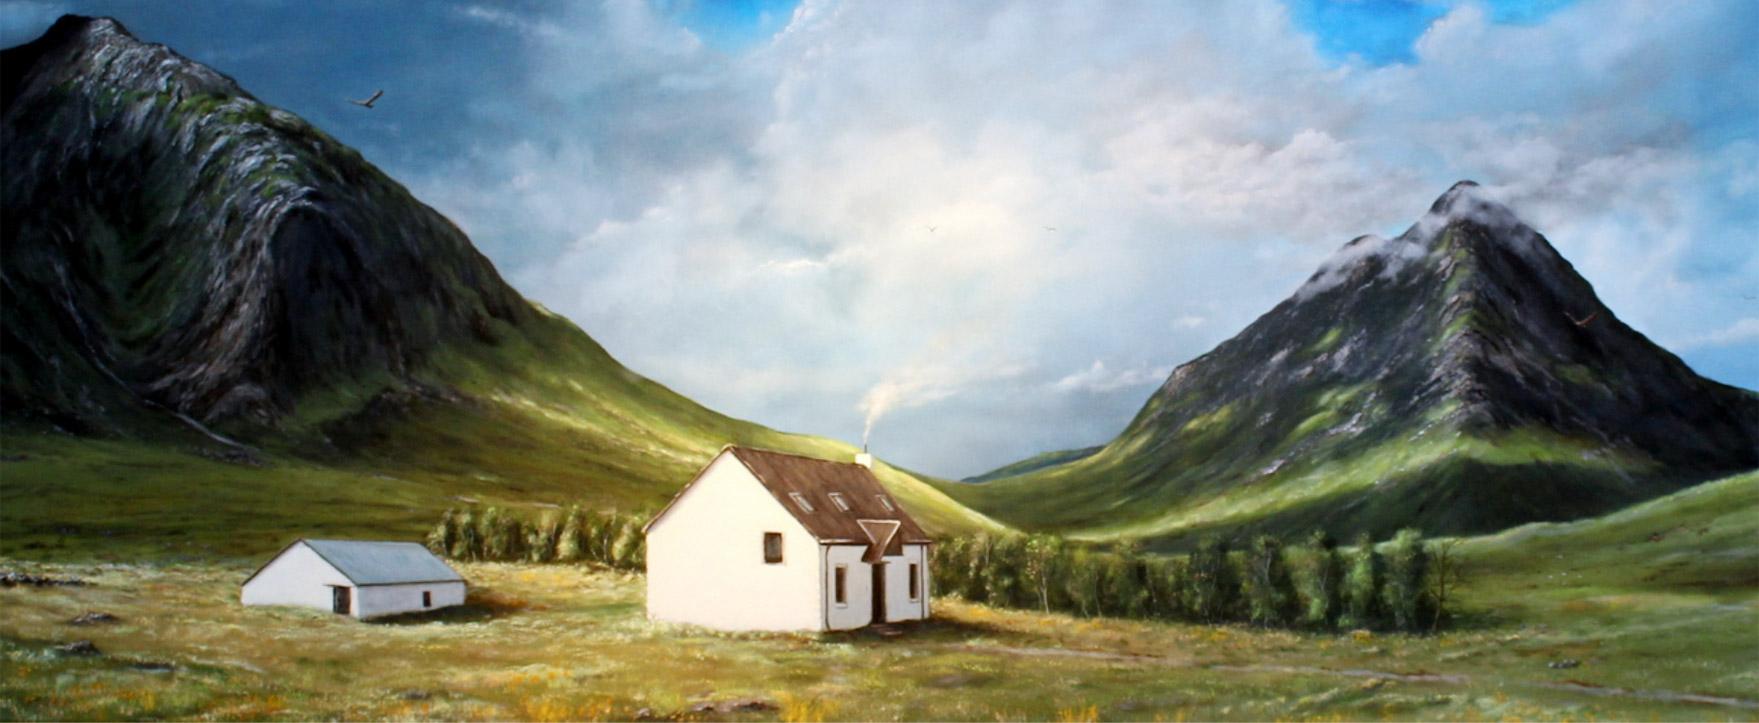 Glen Coe Highlands / Scotland, 50 x 150 cm, Oil on canvas, 2016